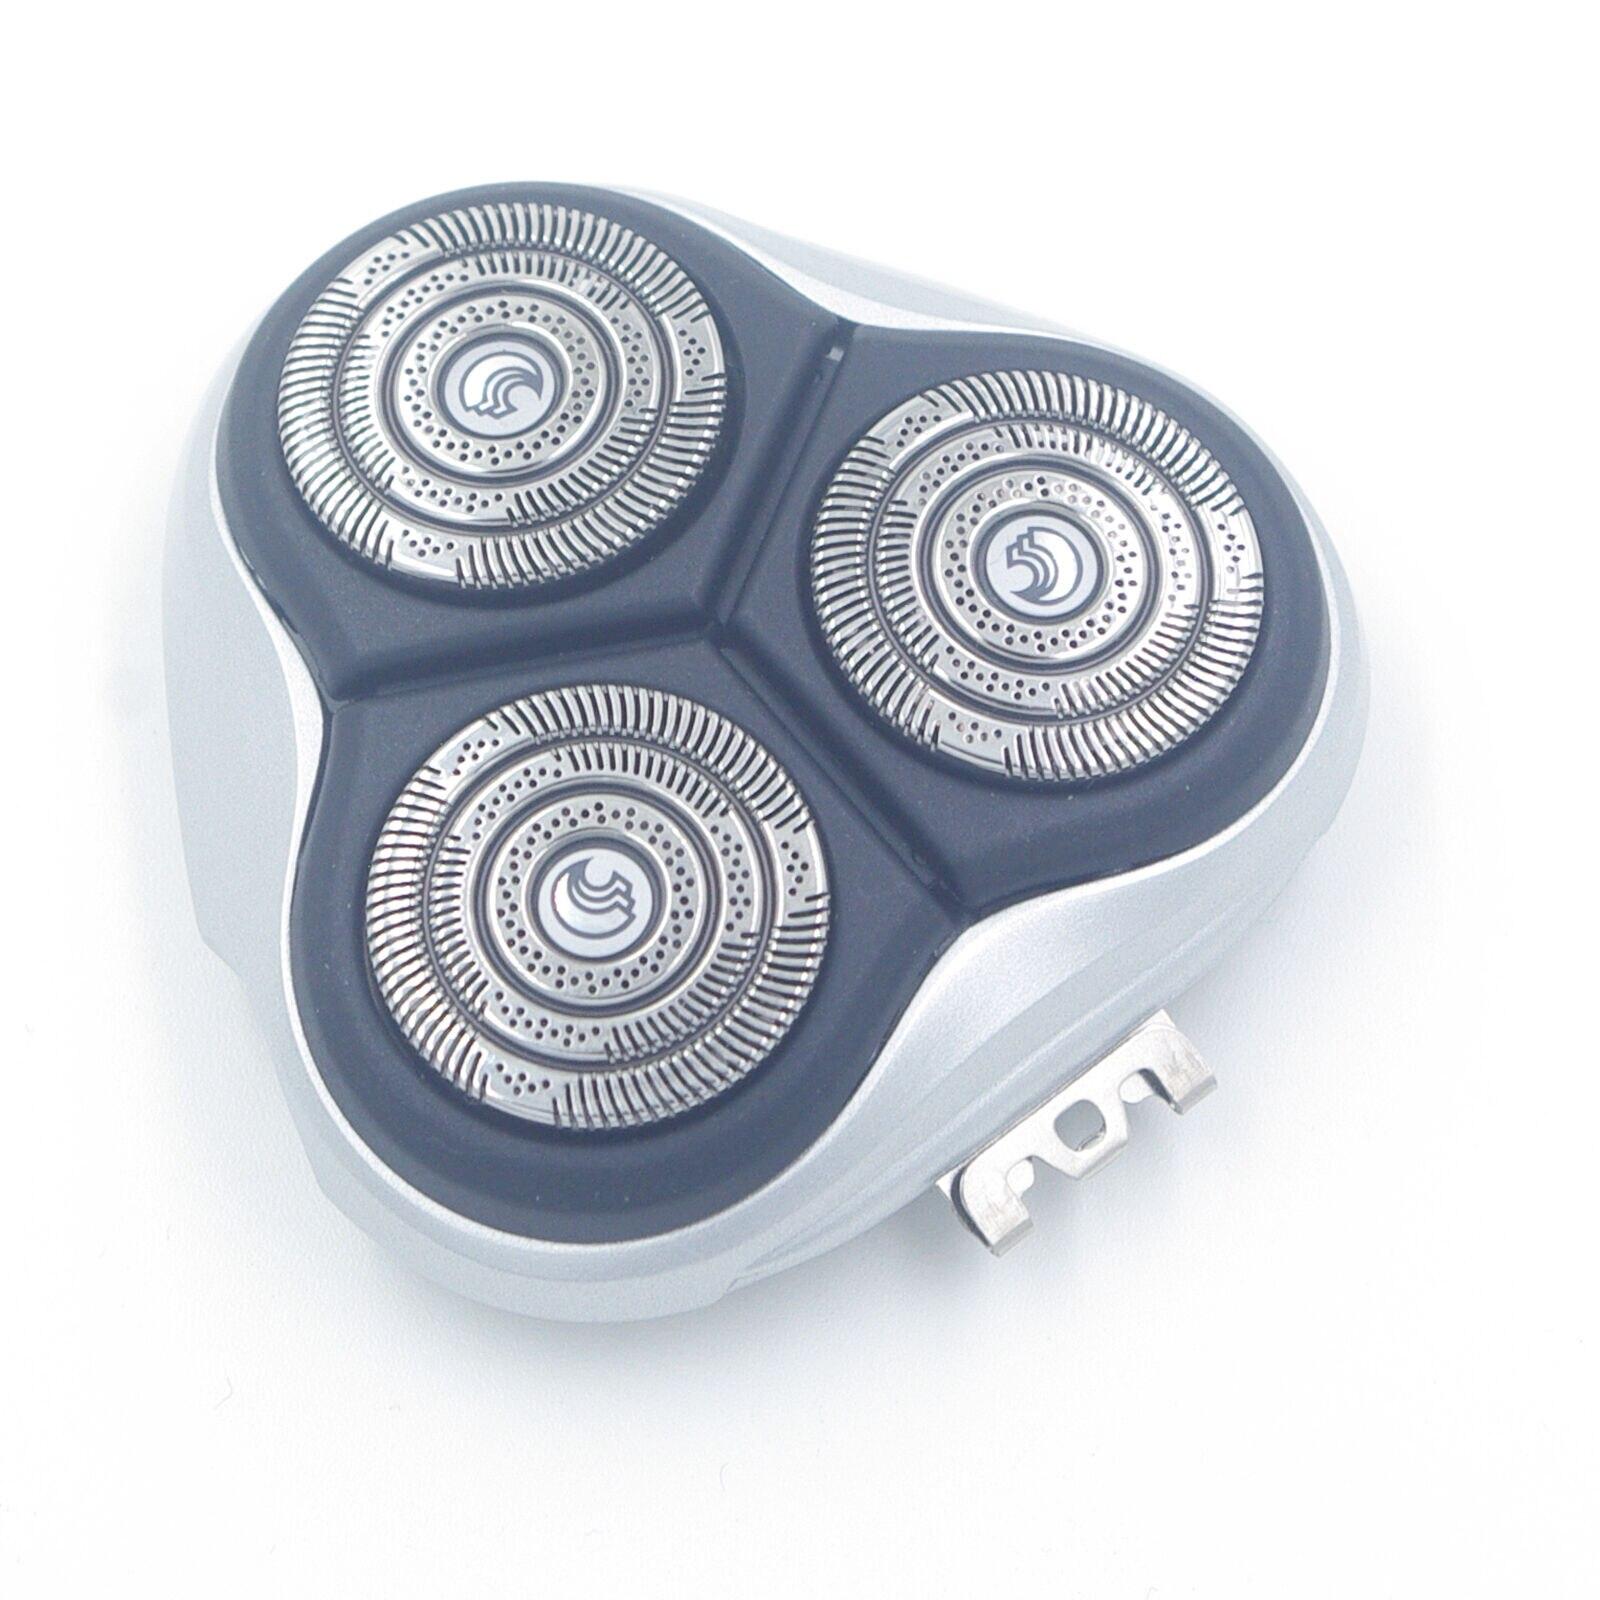 Полный набор HQ9 бритвенная головка Замена для Philips AT920 AT921PT870 AT830 AT880 AT895 PT870CC PT927 AT940 PT920 лезвие бритвы|Бритва|   | АлиЭкспресс